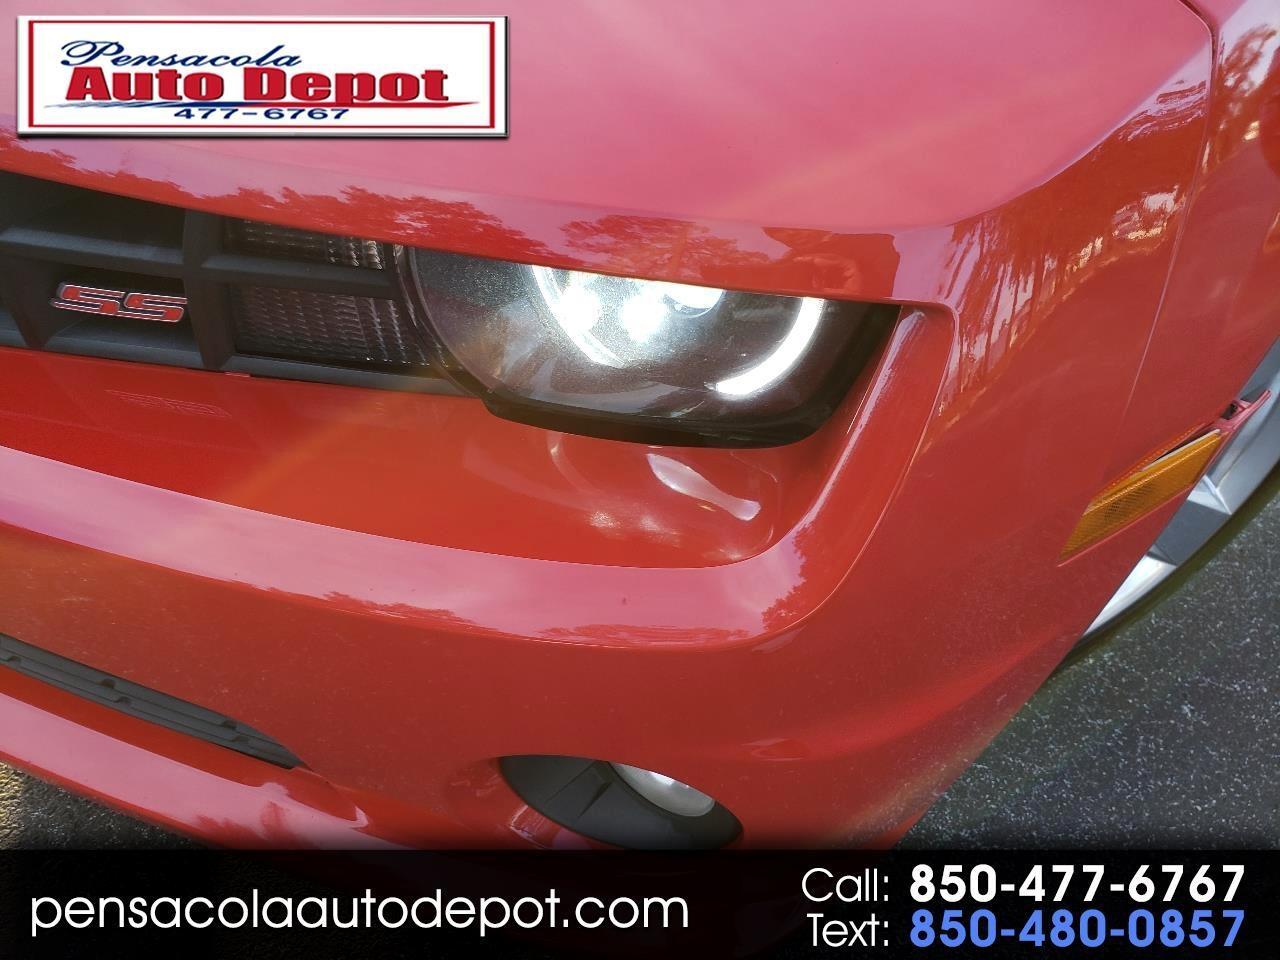 2011 Chevrolet Camaro 2SS Coupe